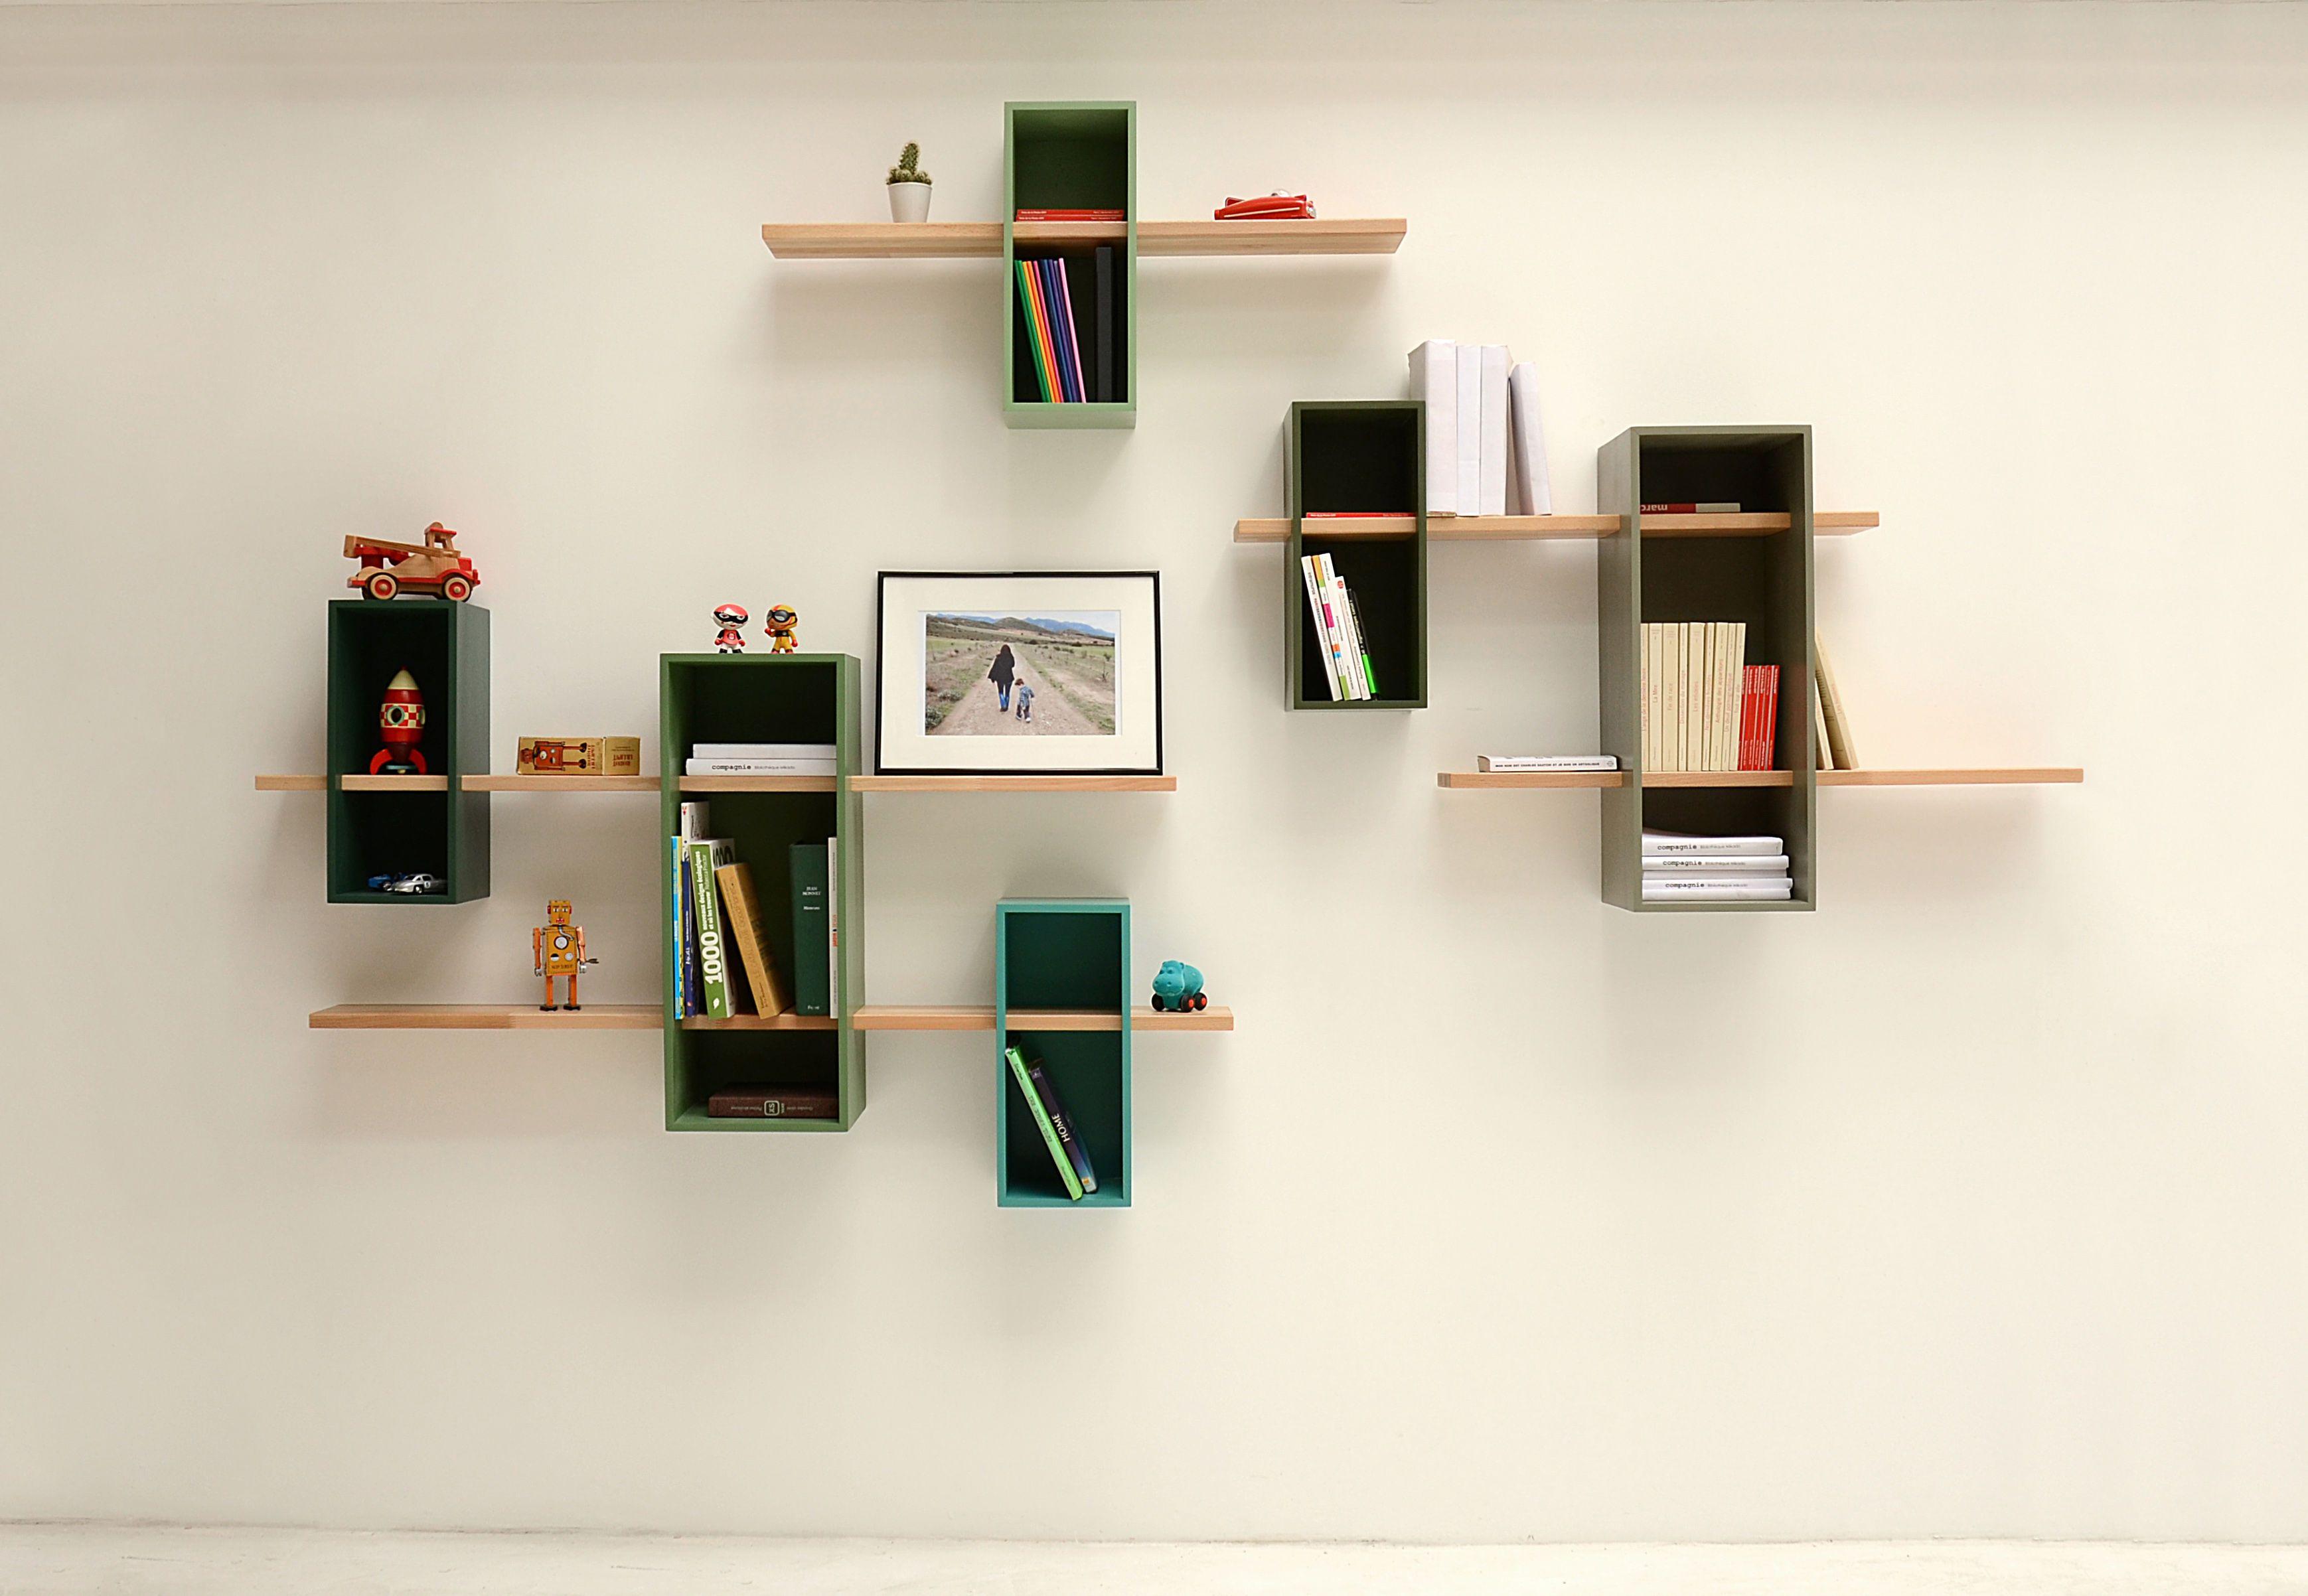 ... Idee Wand Regal Holz Grün interessant-Bücherregal design